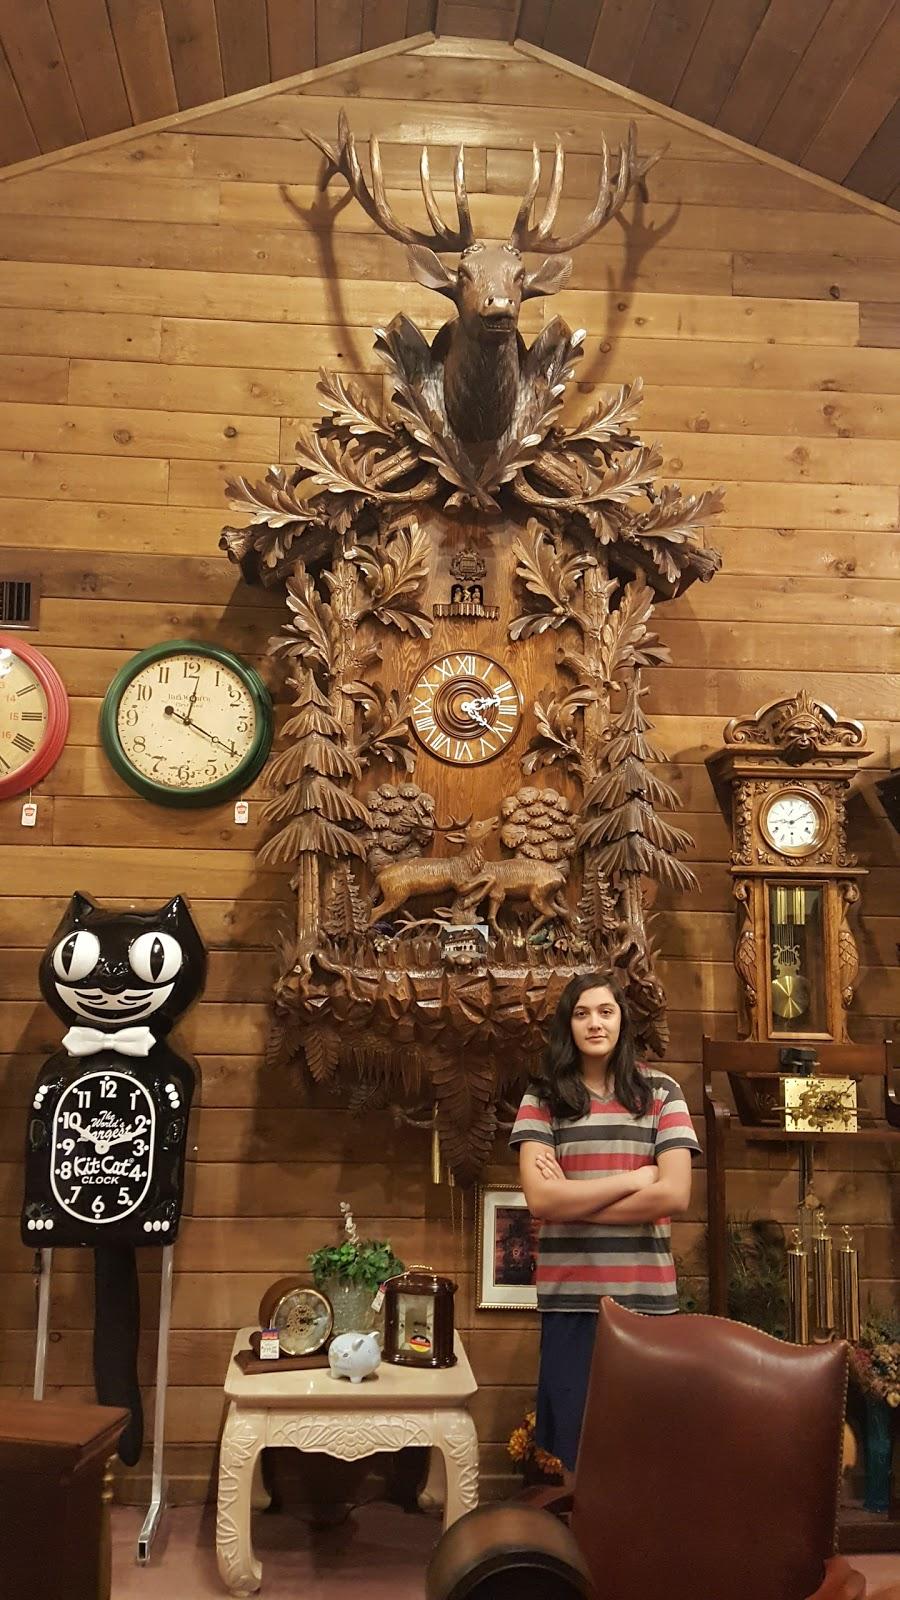 Champs Clock Shop - museum    Photo 9 of 10   Address: 3834 King Dr, Douglasville, GA 30135, USA   Phone: (770) 942-2128